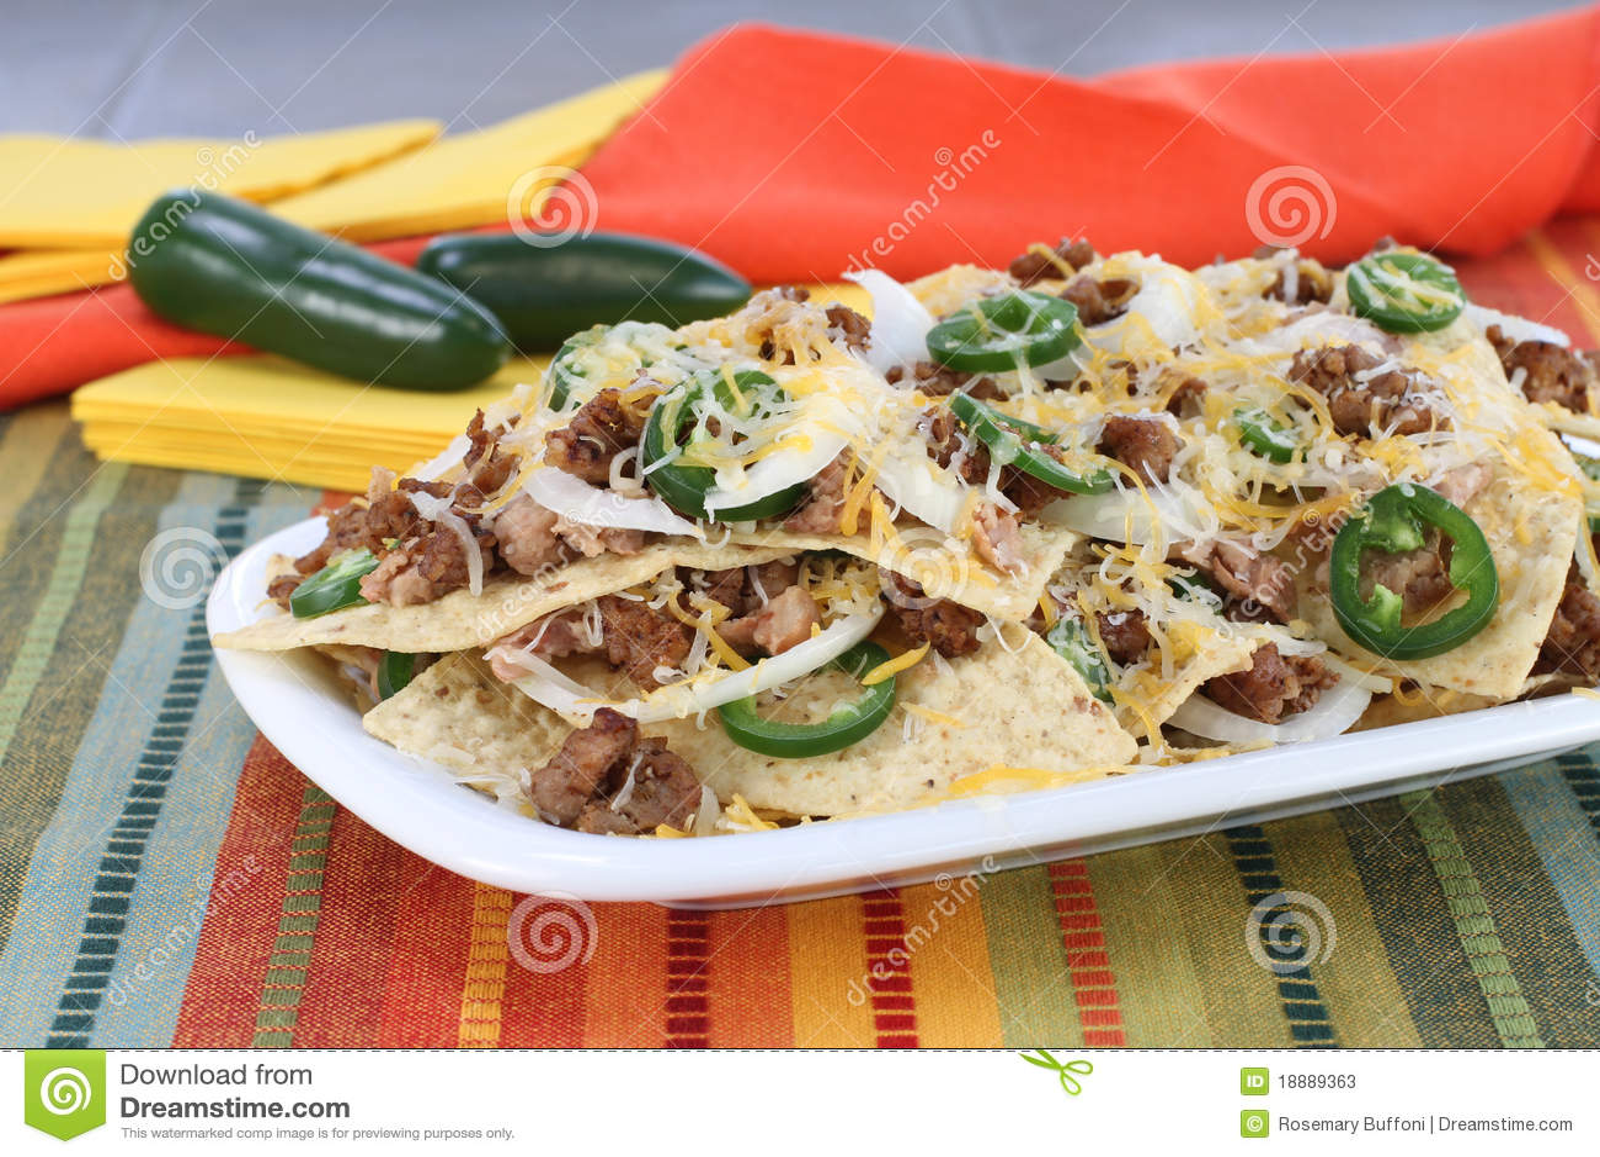 Mexican Sausage, Bean And Cheese Nachos Stock Photos - Image: 18889363